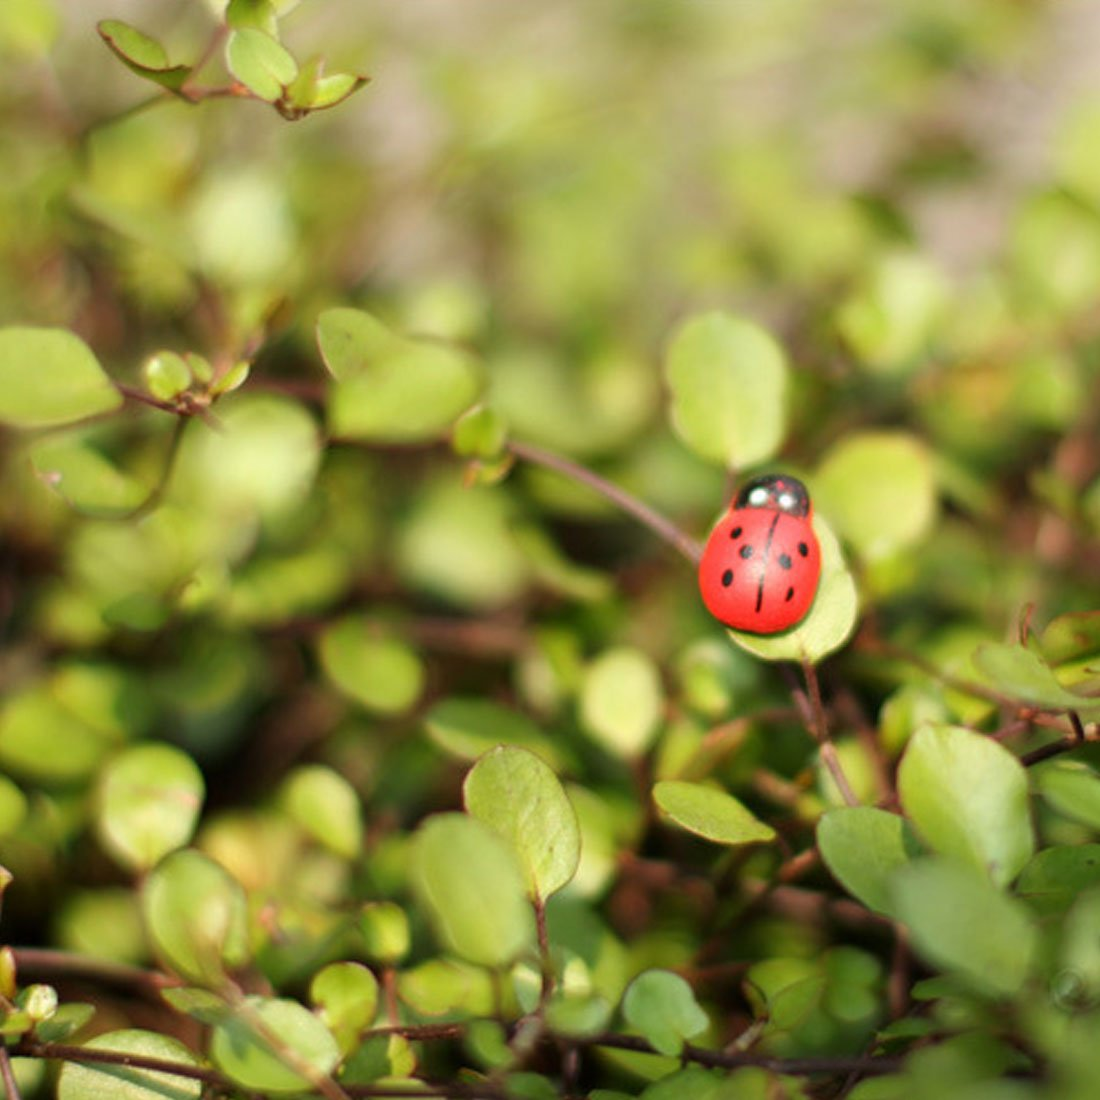 Amazon.com : Mini Ladybugs, Self-Adhesive Ladybugs Wooden Ladybug ...